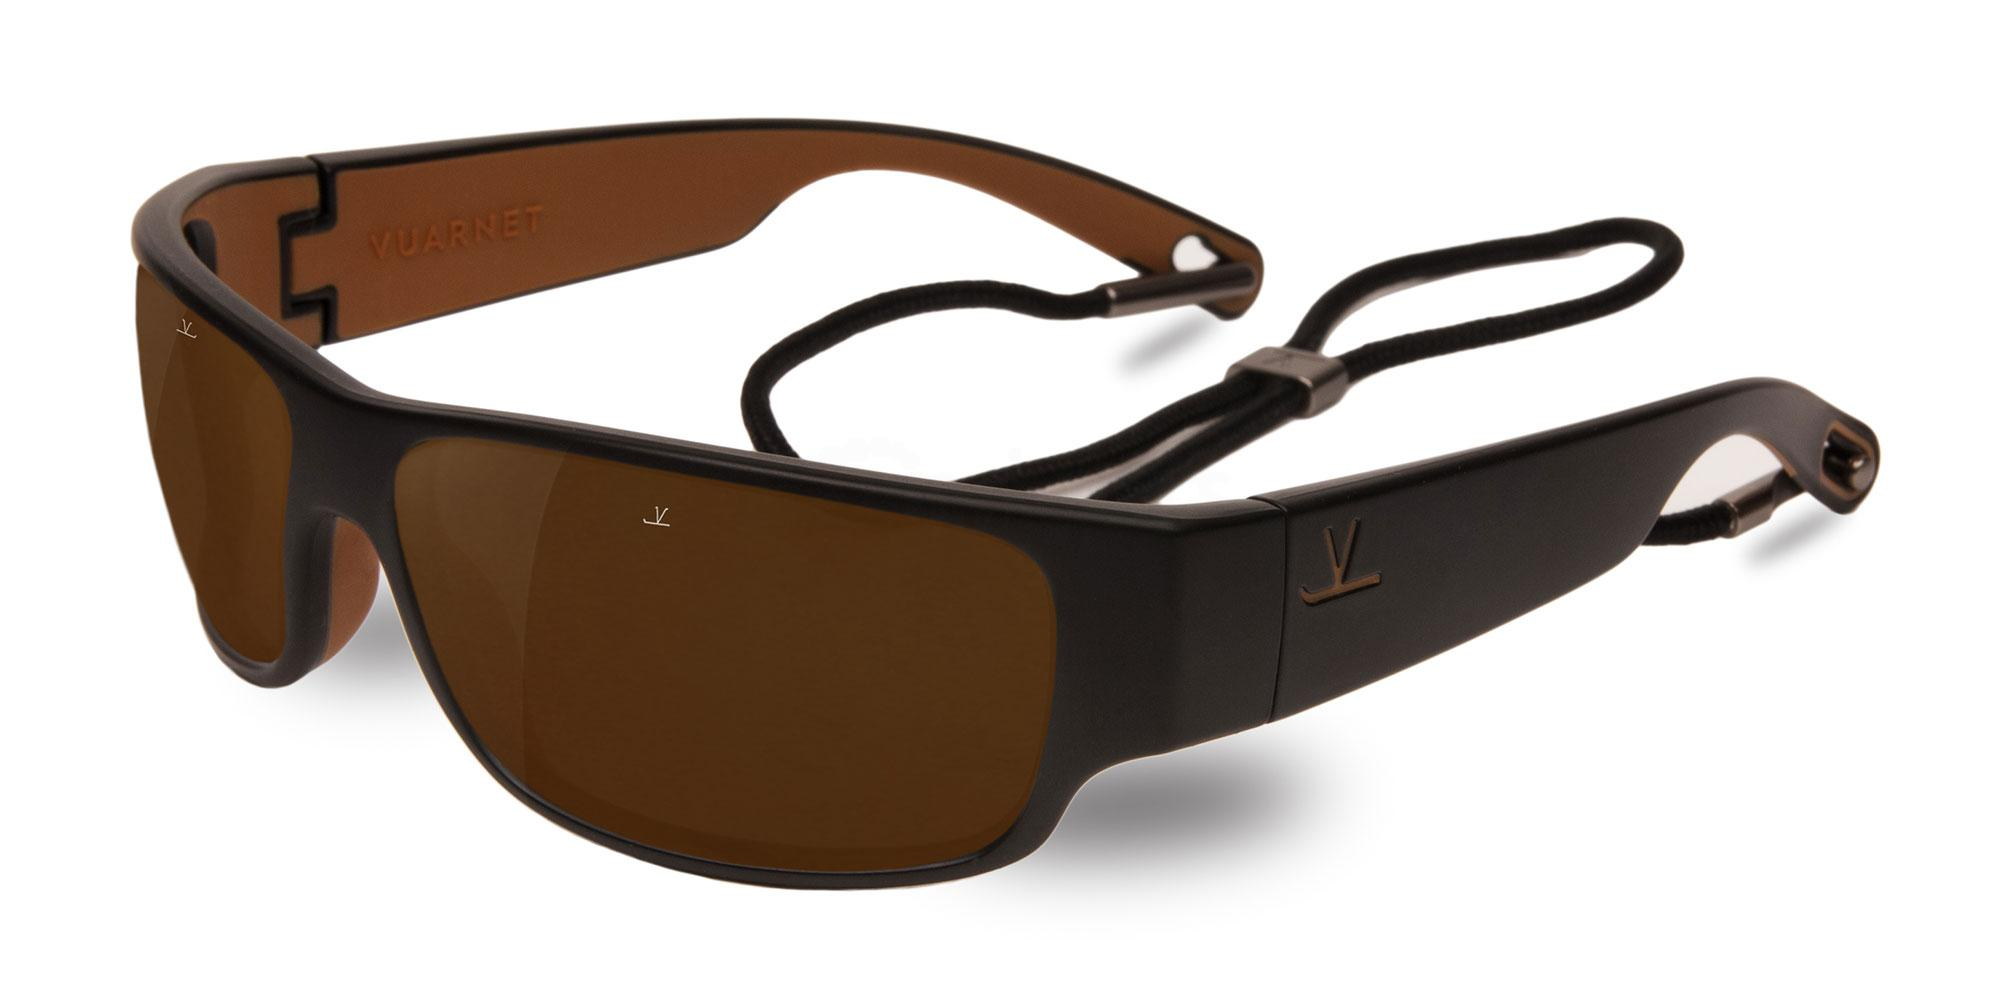 VL162100012182 VL1621 Sunglasses, Vuarnet